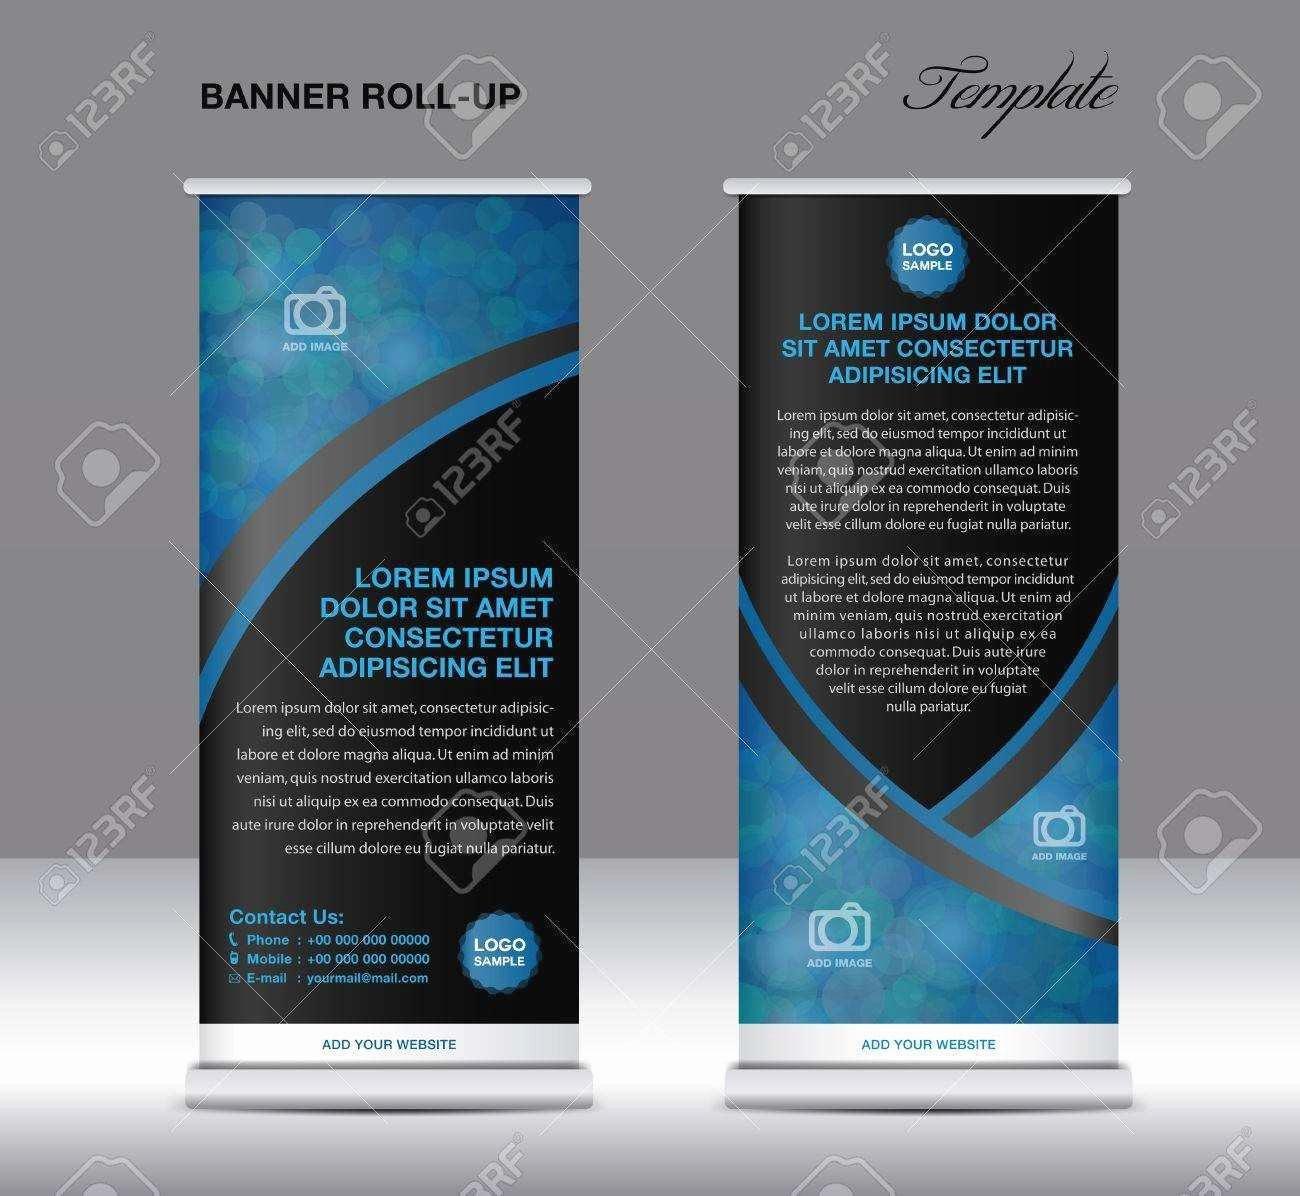 Retractable Banner Design Template Luxury Lovely 33x80 Retractable Banner Template